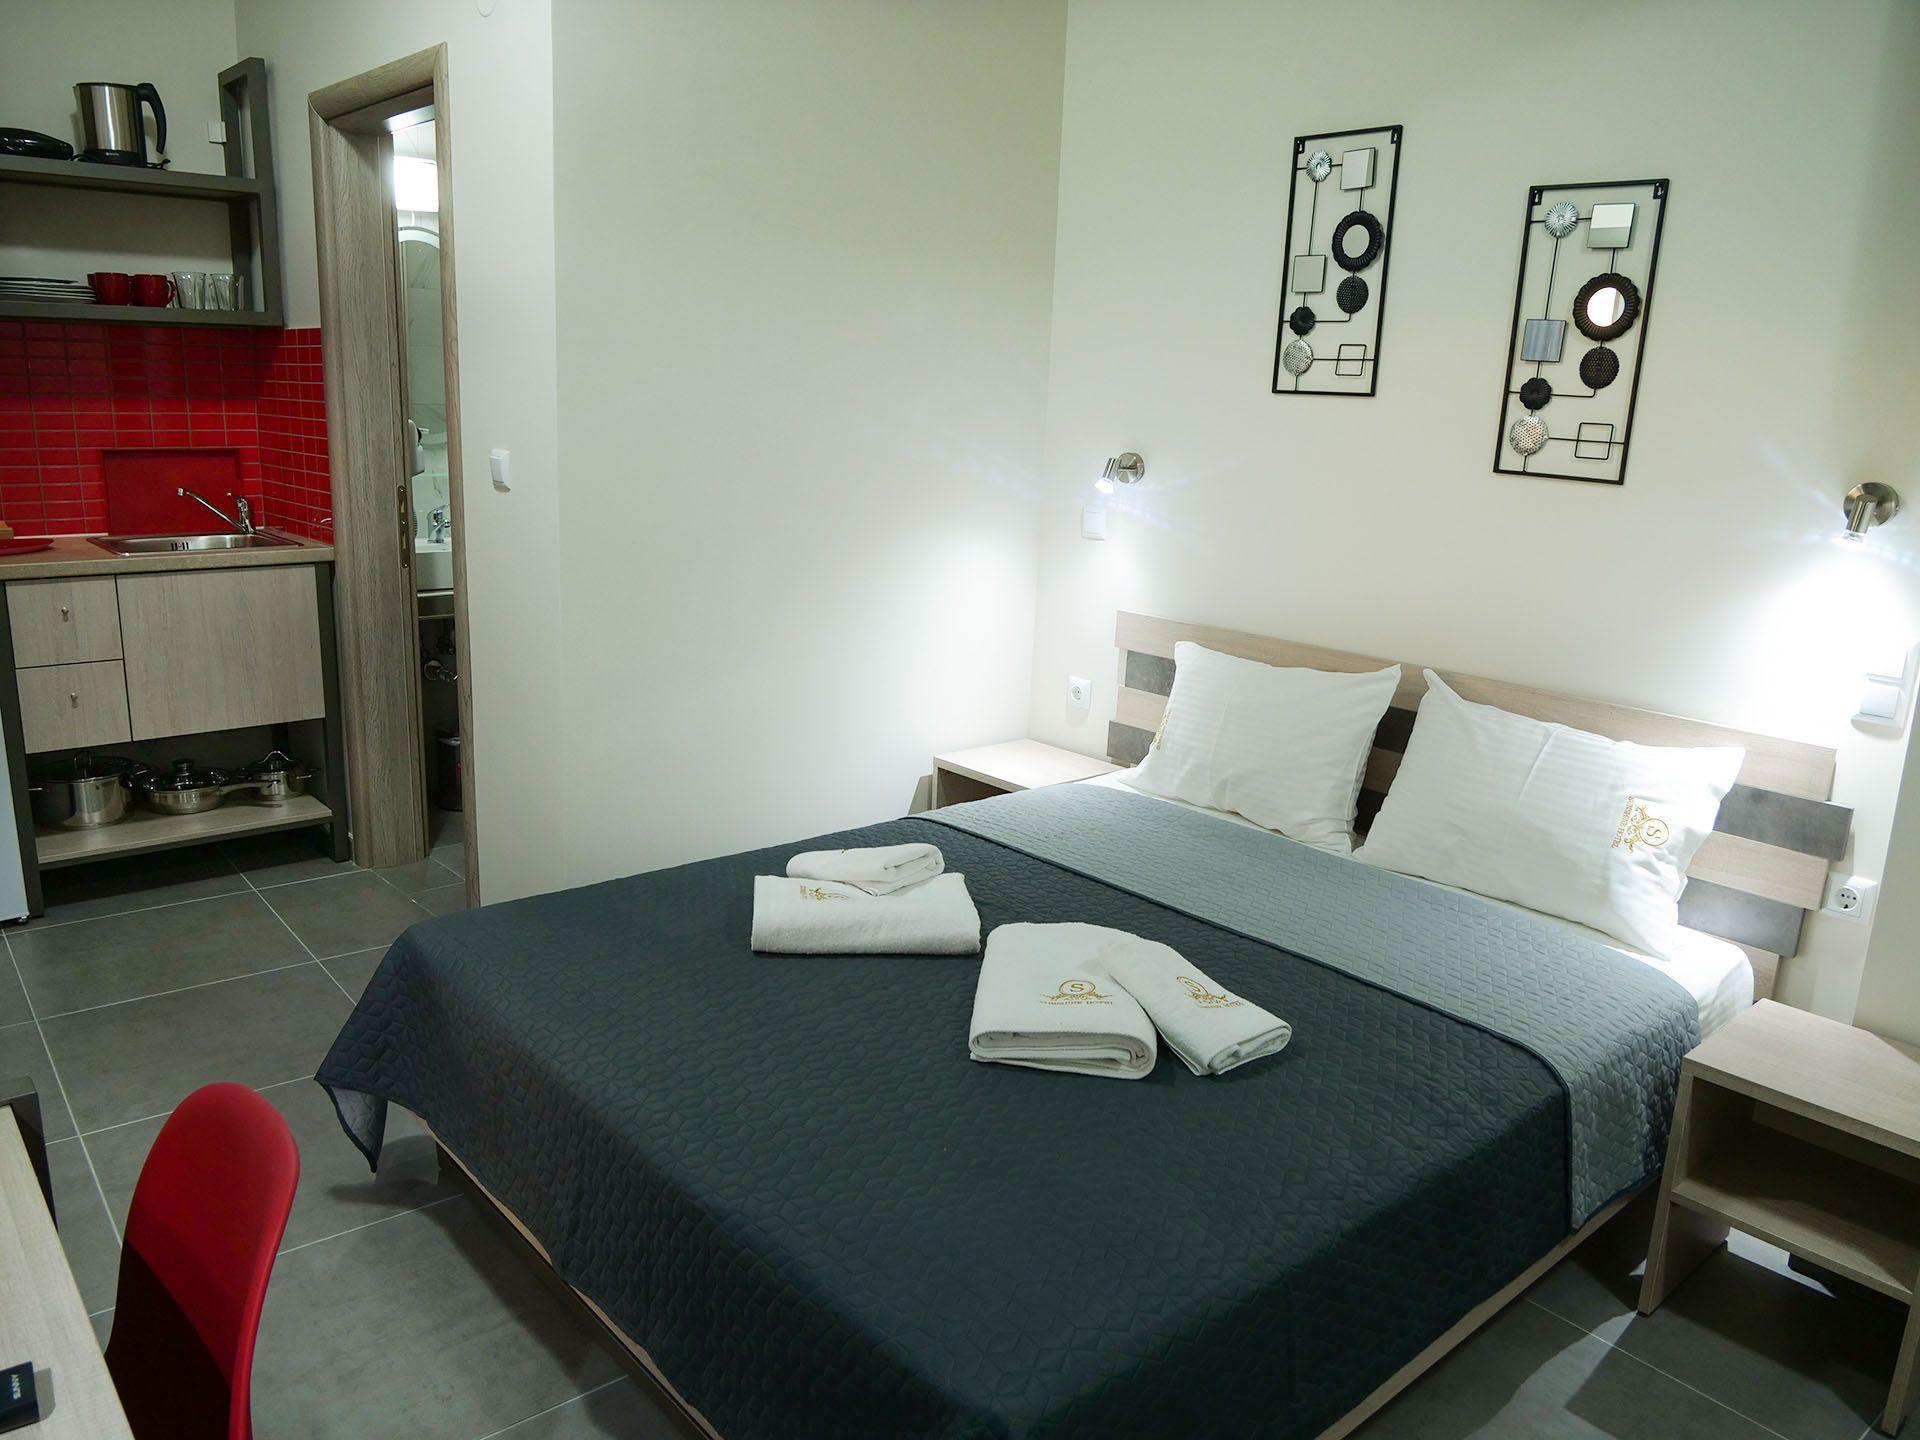 Sunshine Apartments - Σιθωνία, Χαλκιδική ✦ 4 Ημέρες